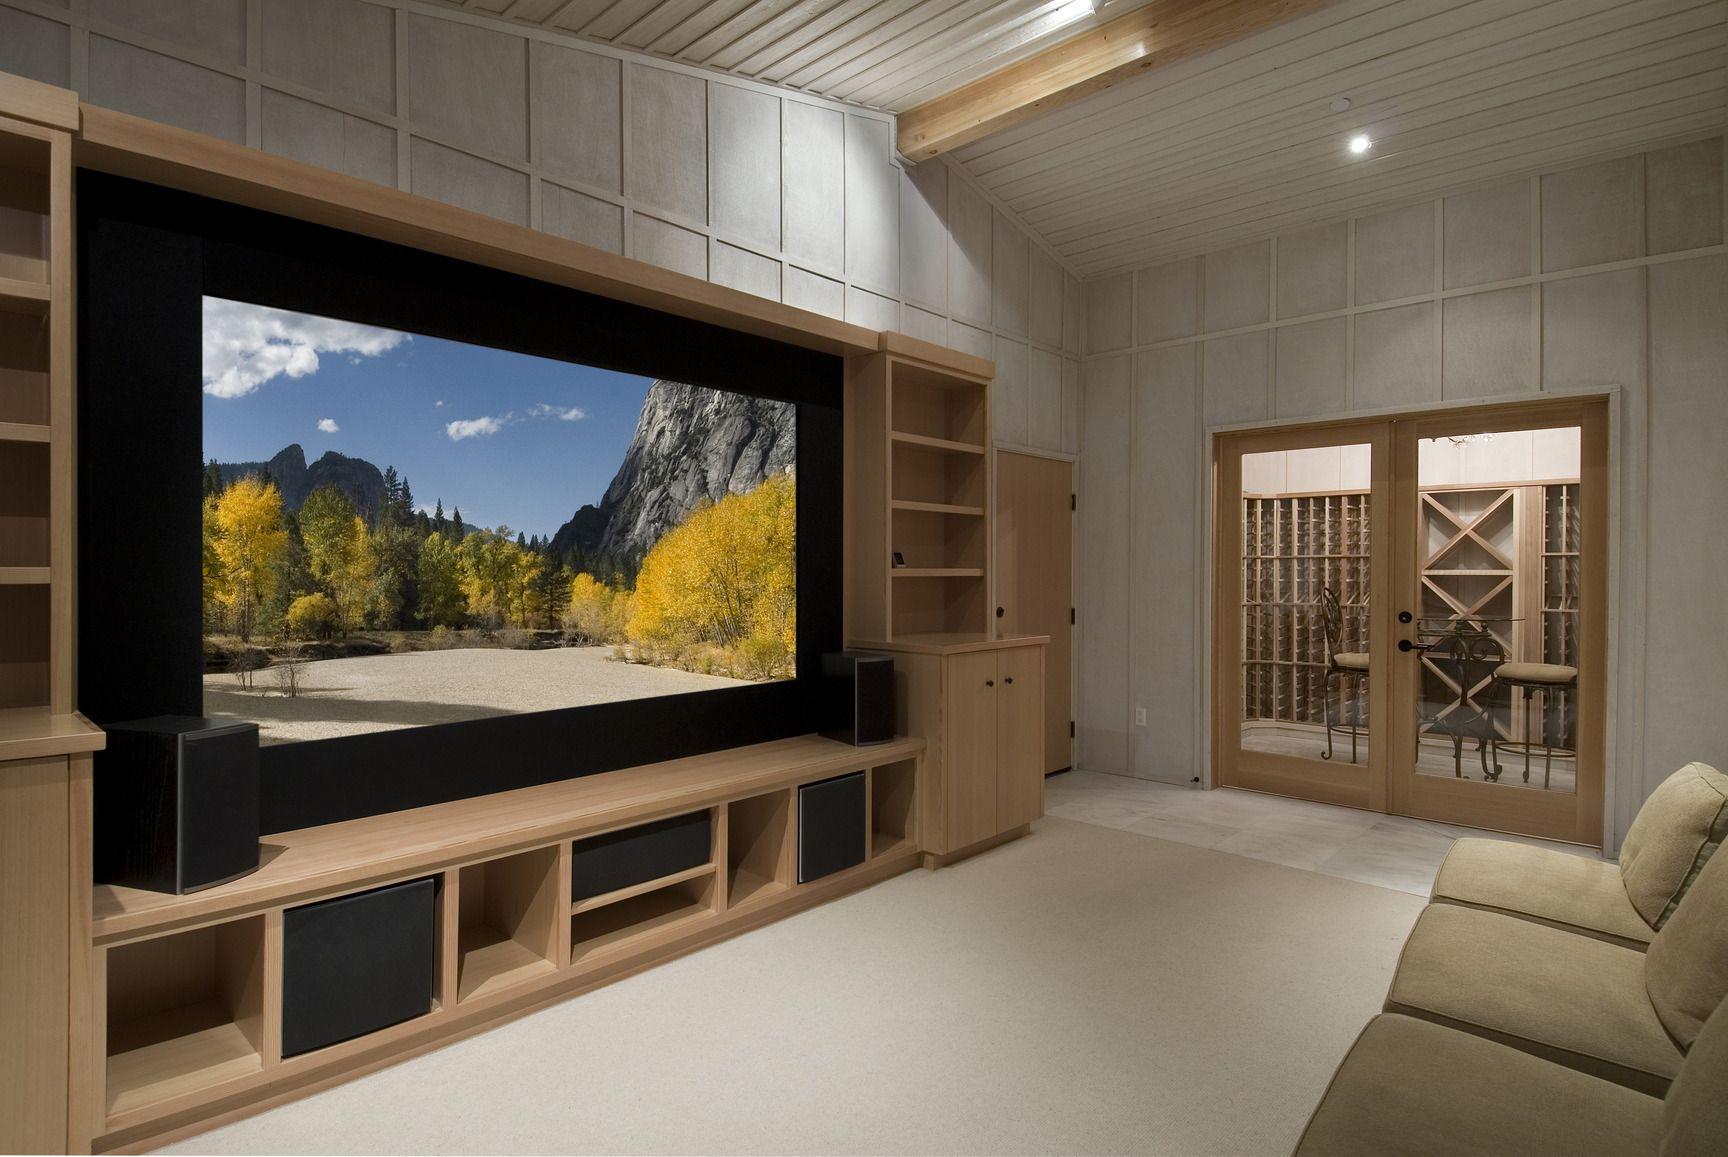 renderings interior bedroom wall paints decorlockpics neatly white ...